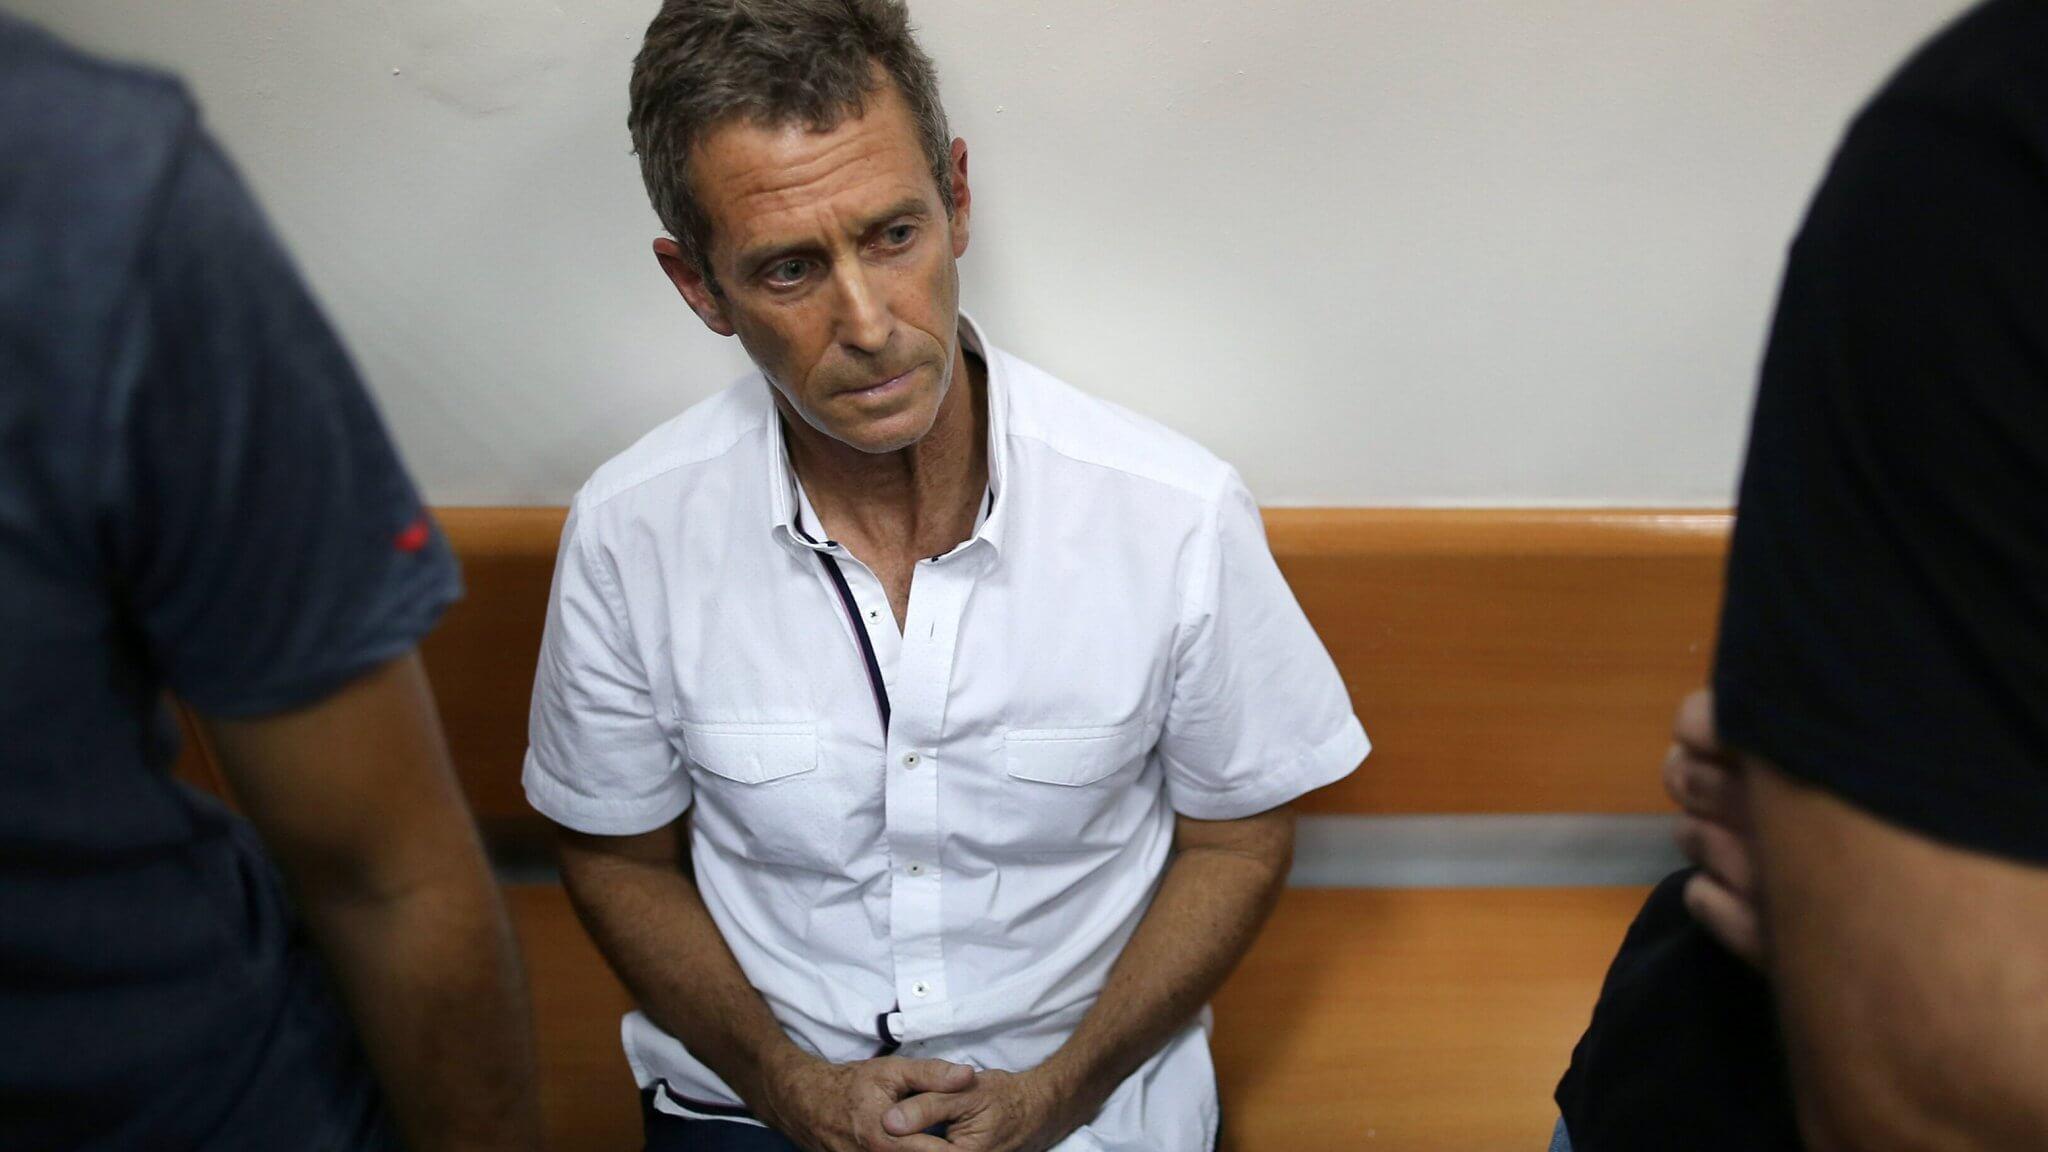 Israeli-billionaire-Beny-Steinmetz-faces-trial-over-'Guinea-bribes'